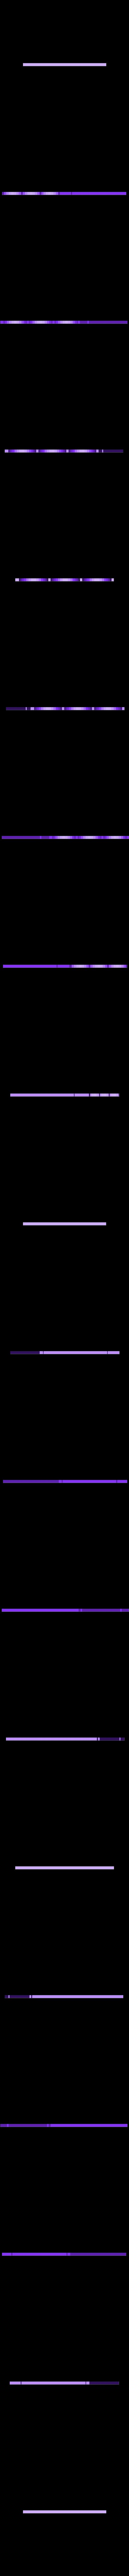 rack.STL Download free STL file Sealant rack (organizer) • 3D printer template, jurgistasinas